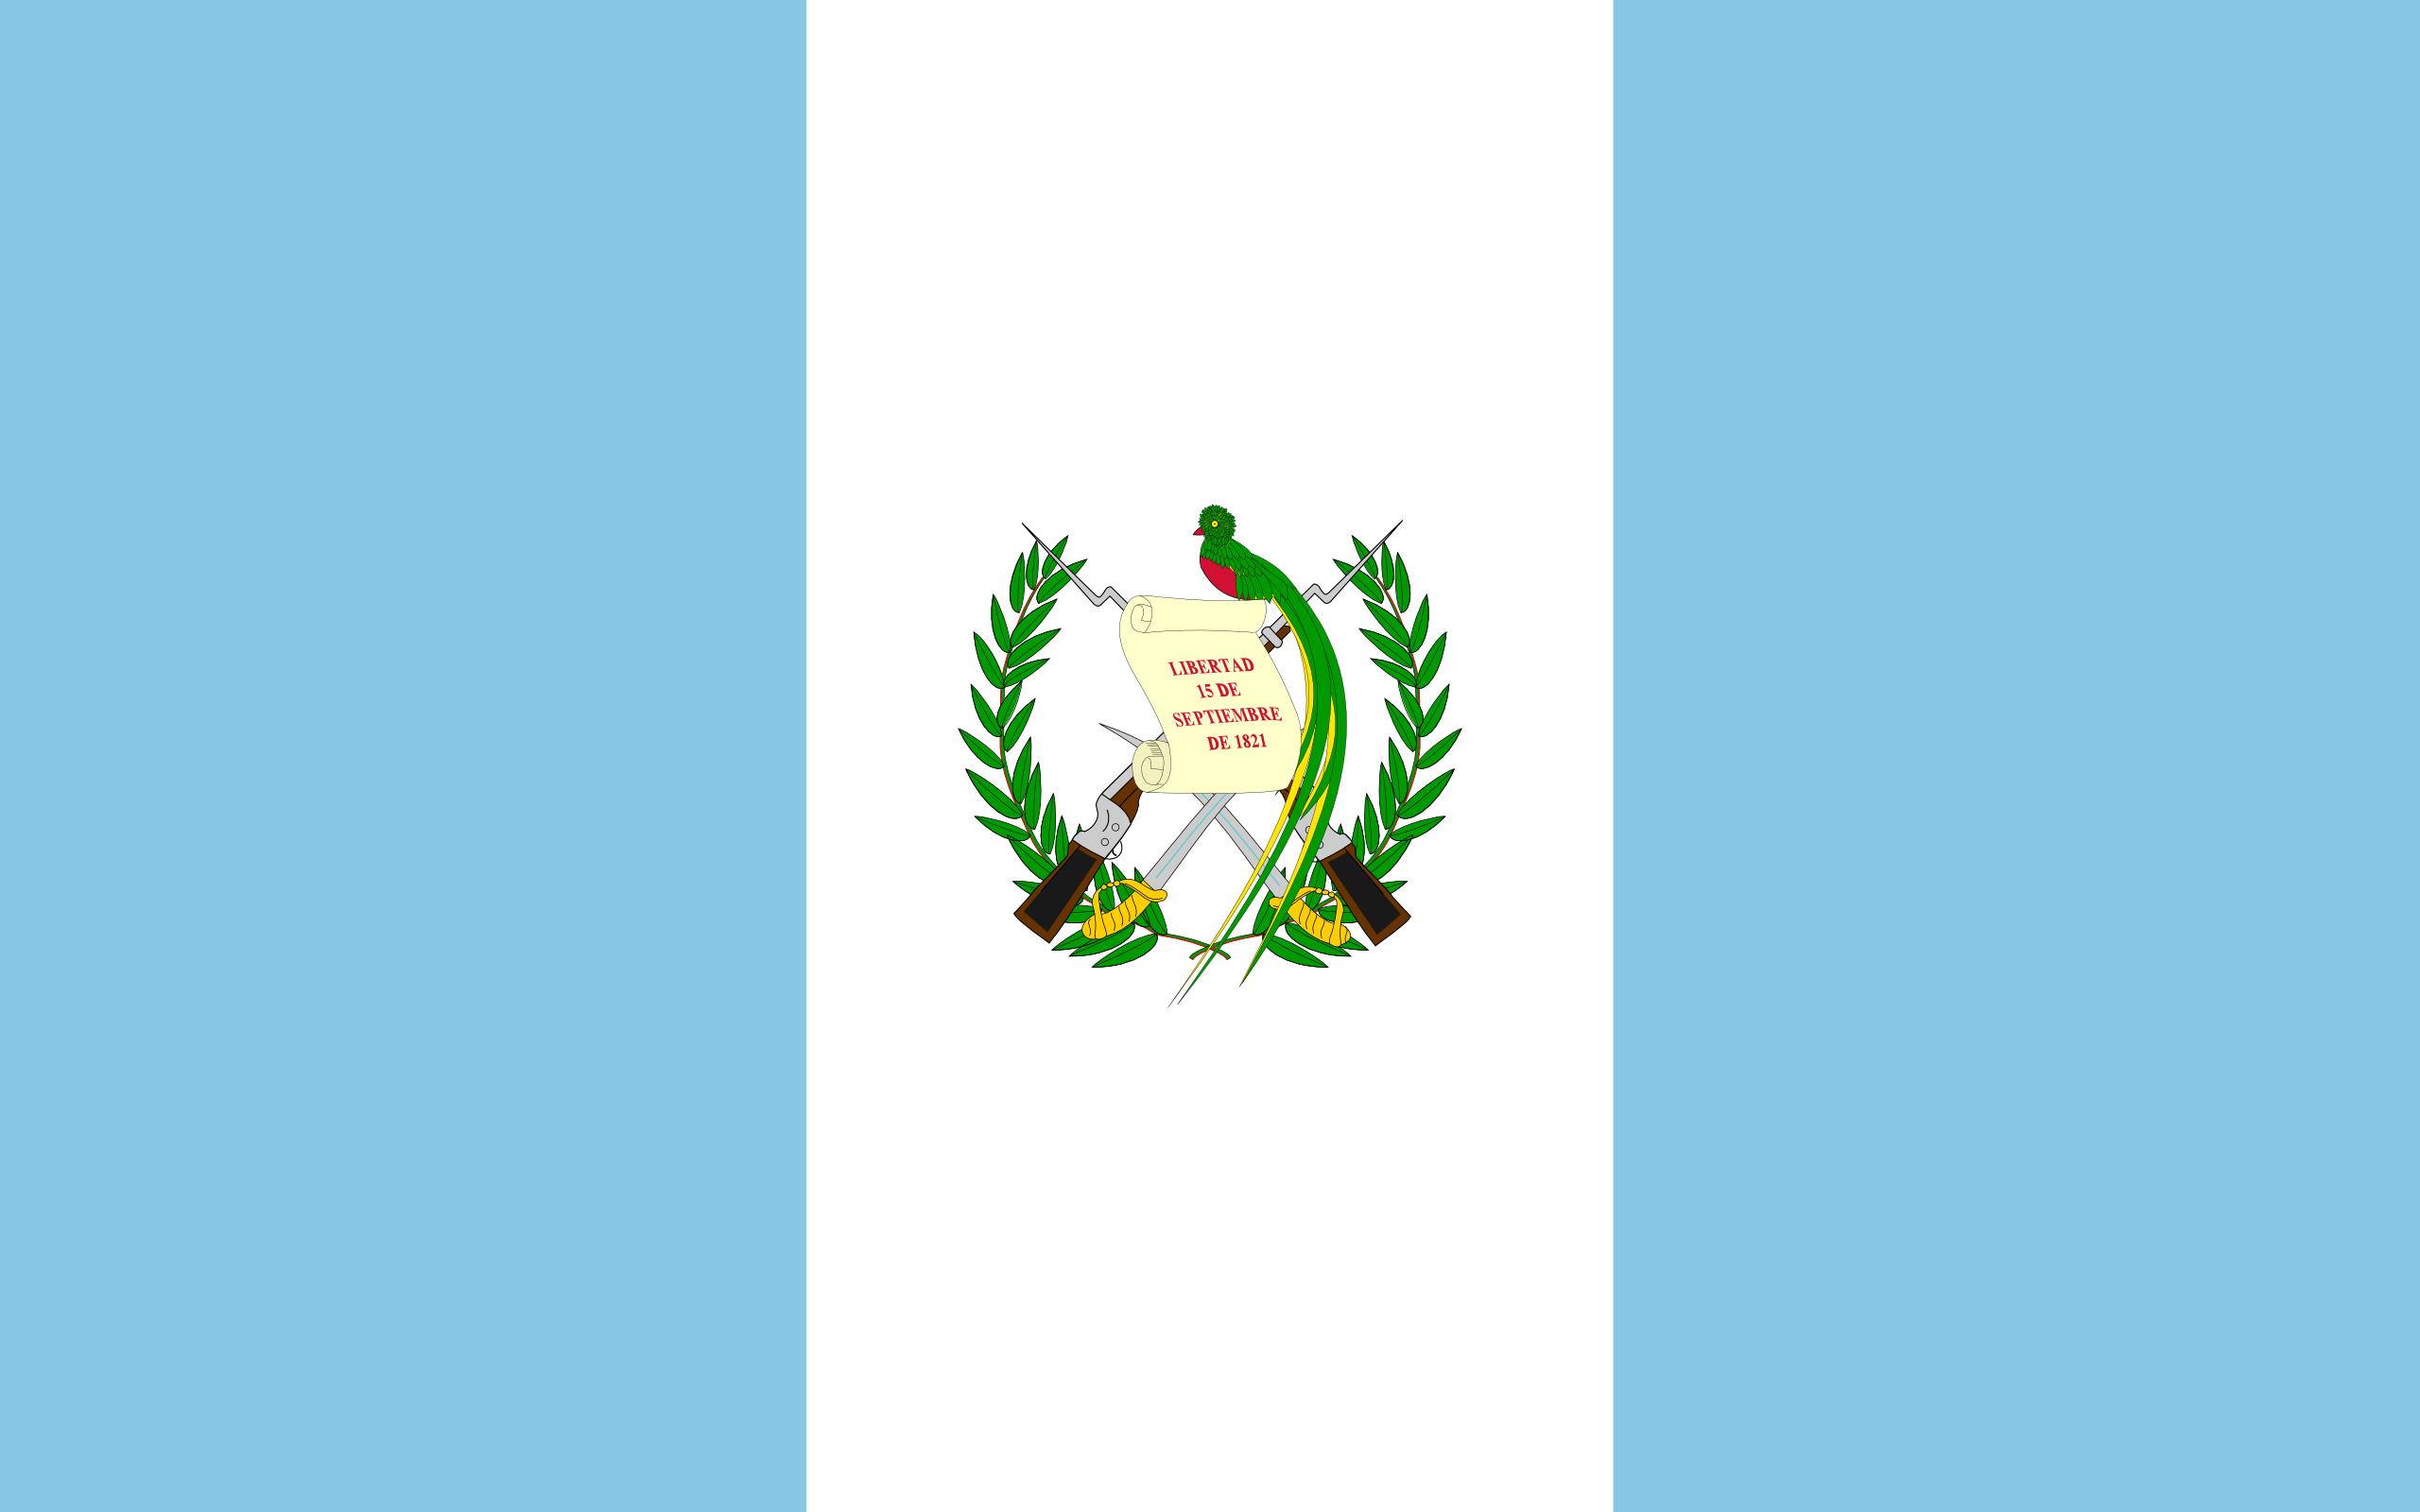 guatemala, देश, emblema, लोग�प्रतीकbolo - HD वॉलपेपर - प्रोफेसर-falken.com